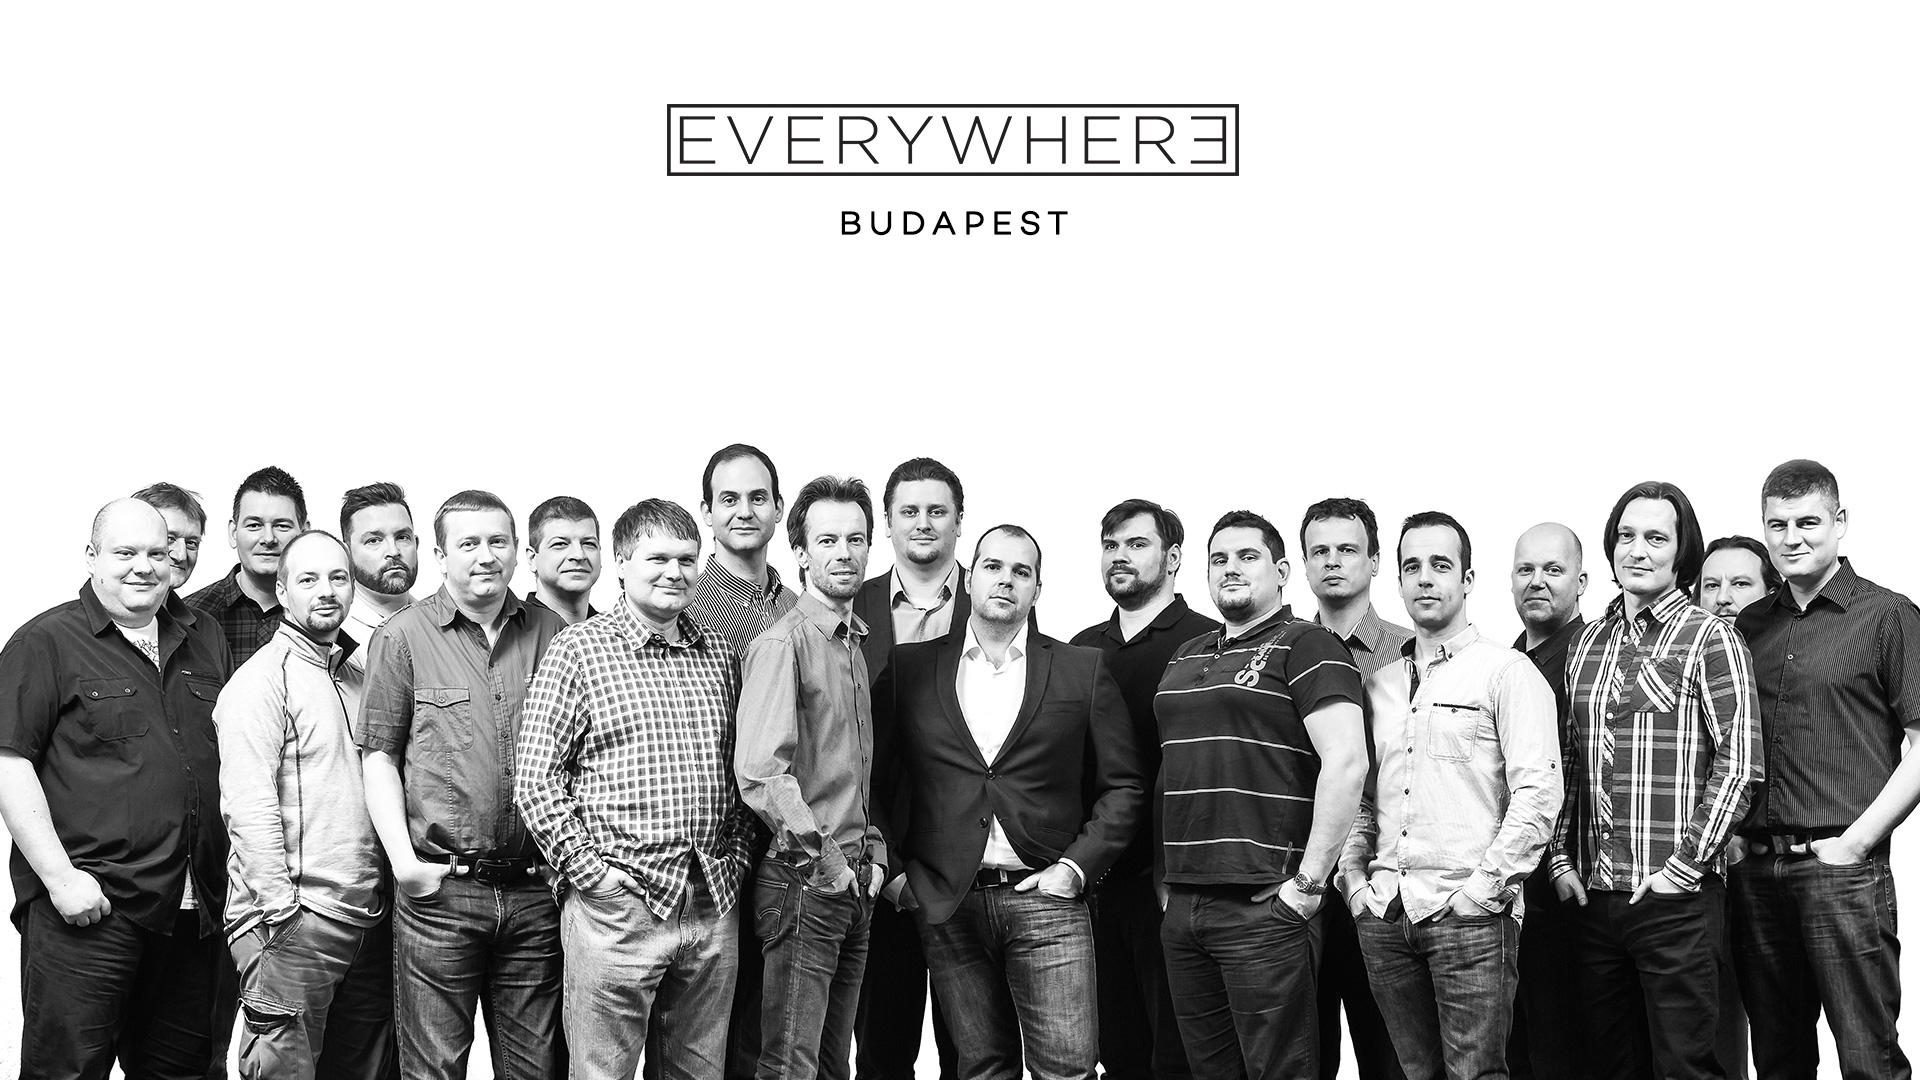 Imagén grupal del equipo de desarrollo de Everywhere Budapest